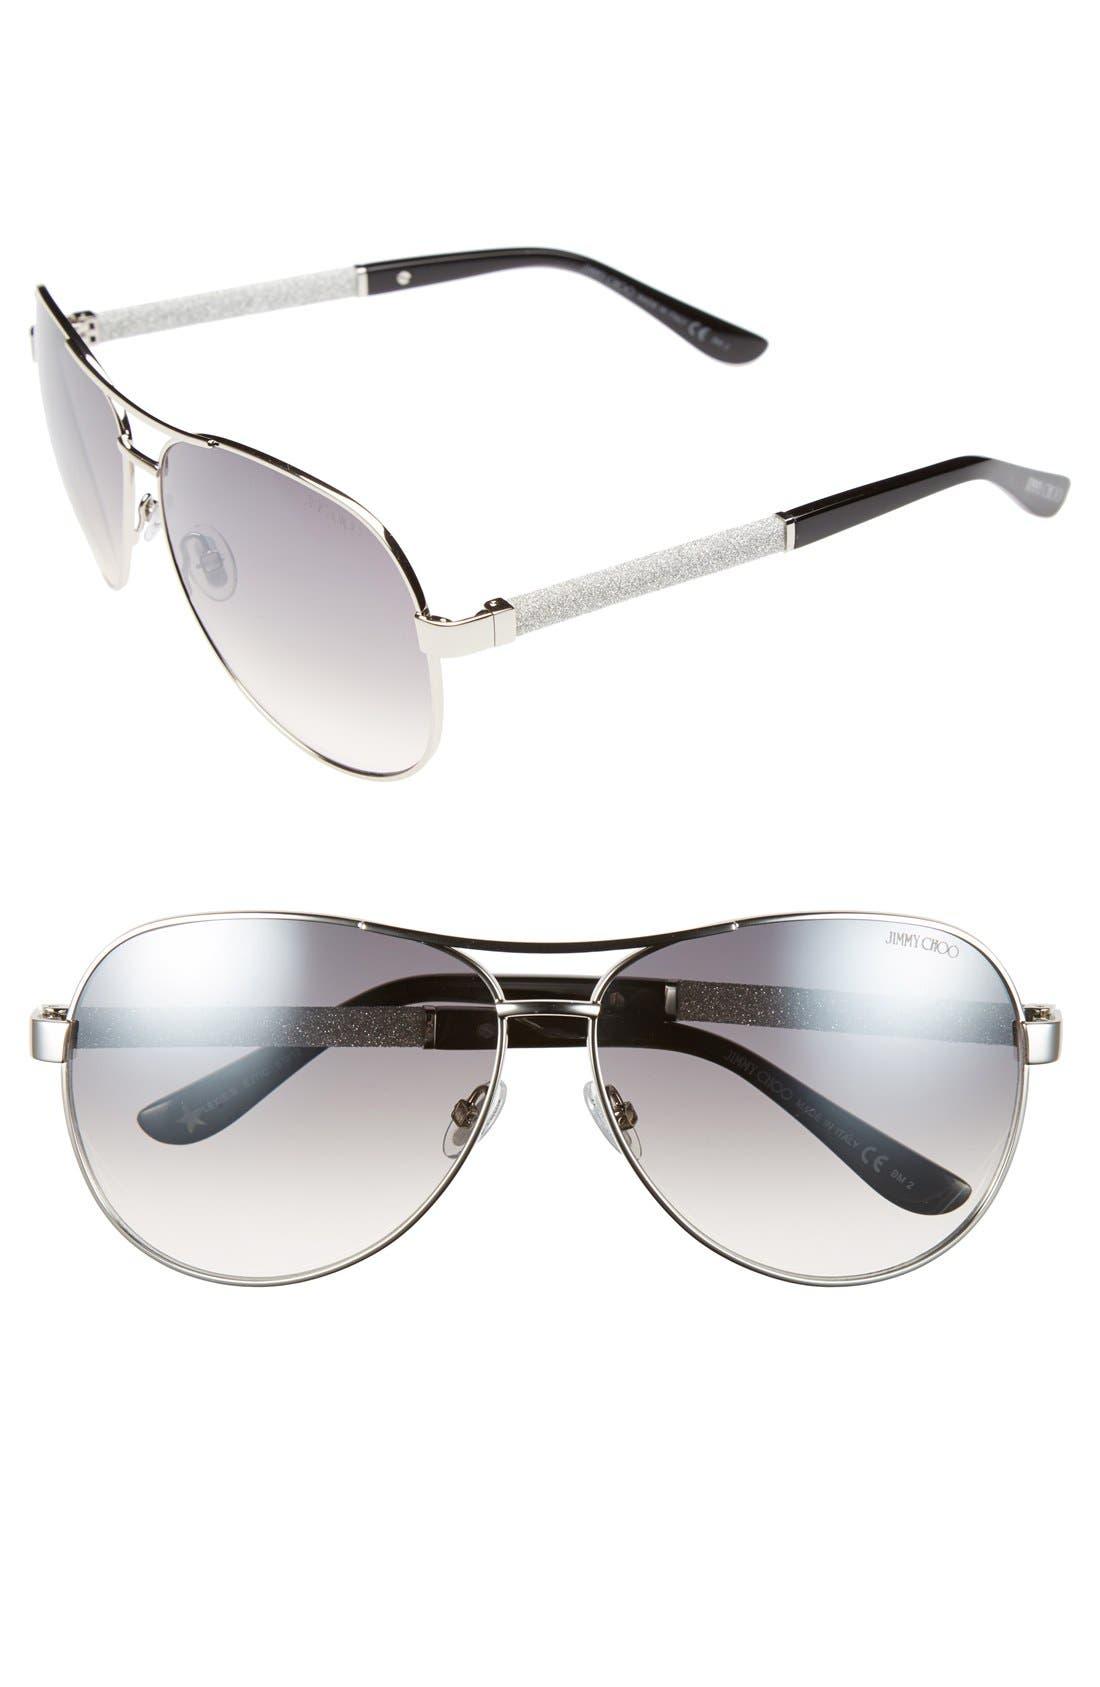 61mm Aviator Sunglasses,                             Main thumbnail 2, color,